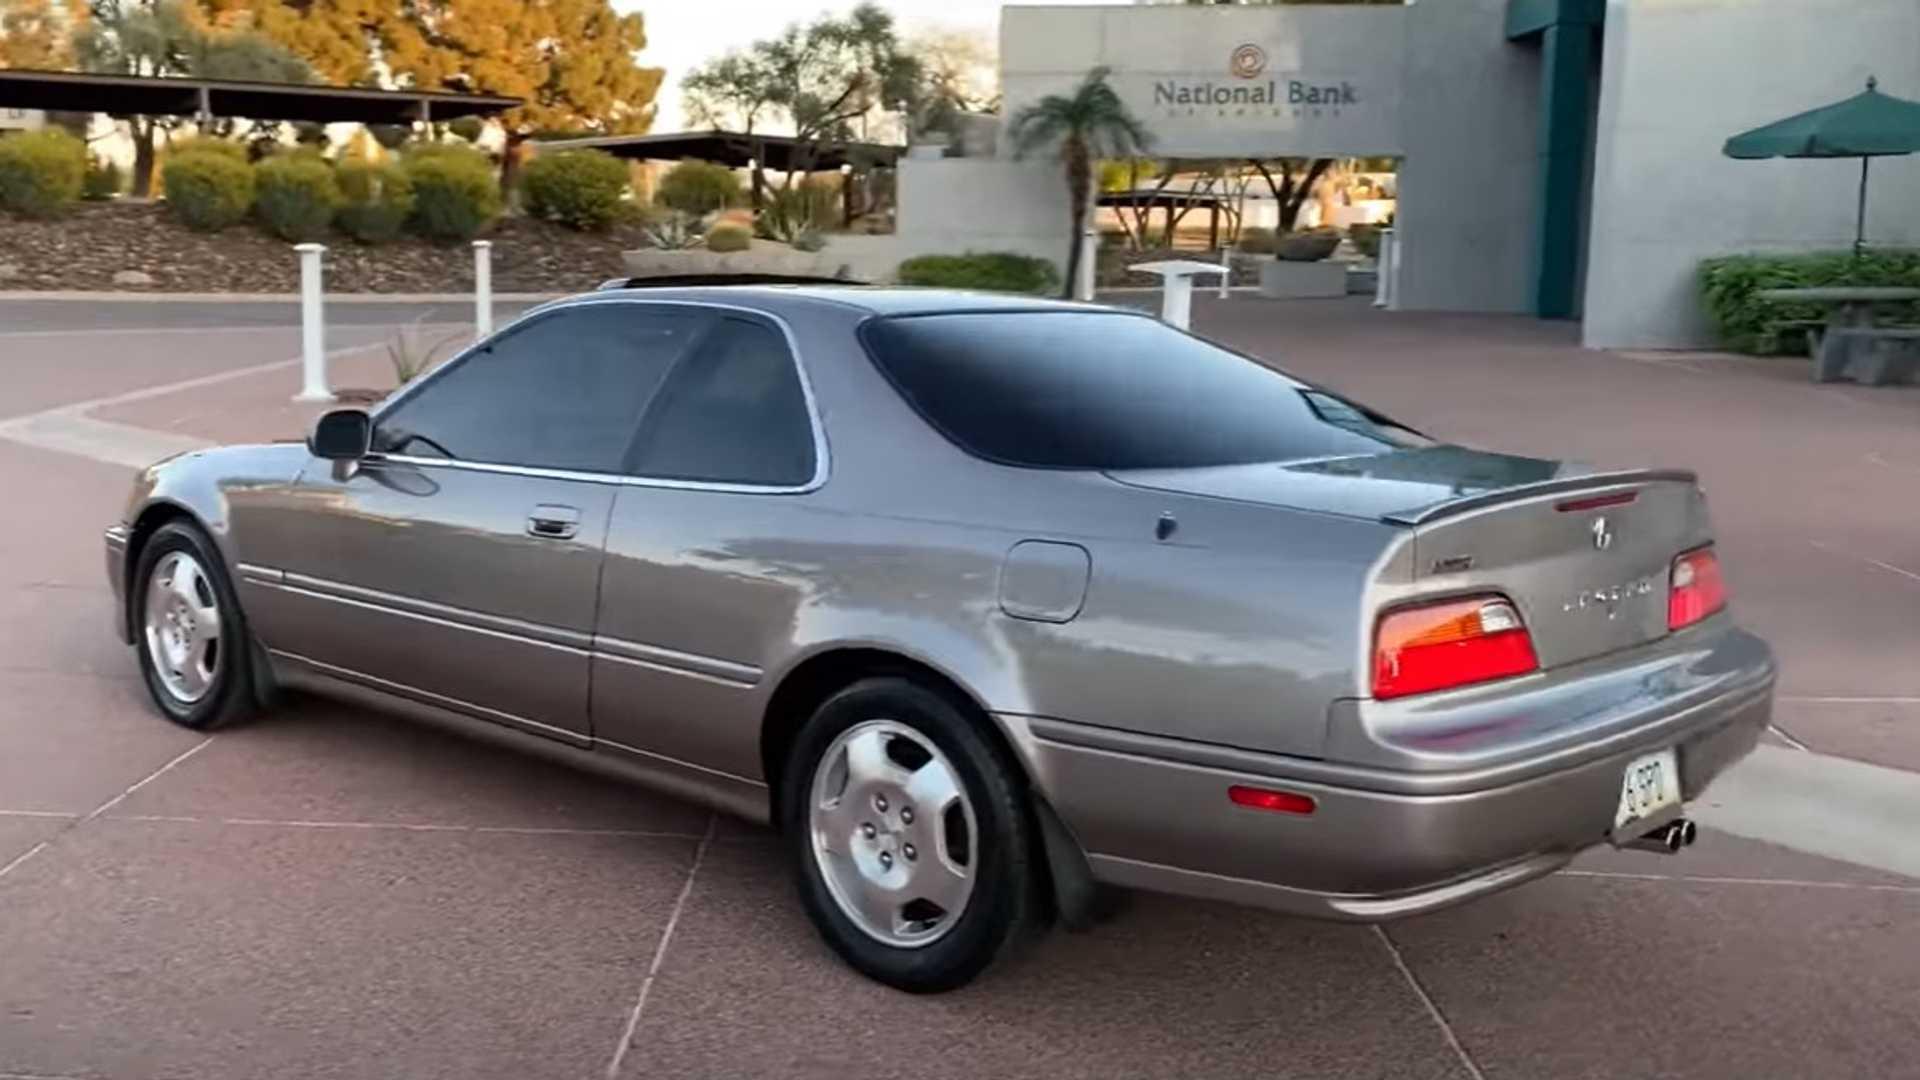 This 572 750 Mile Acura Legend Still Has The Original Clutch